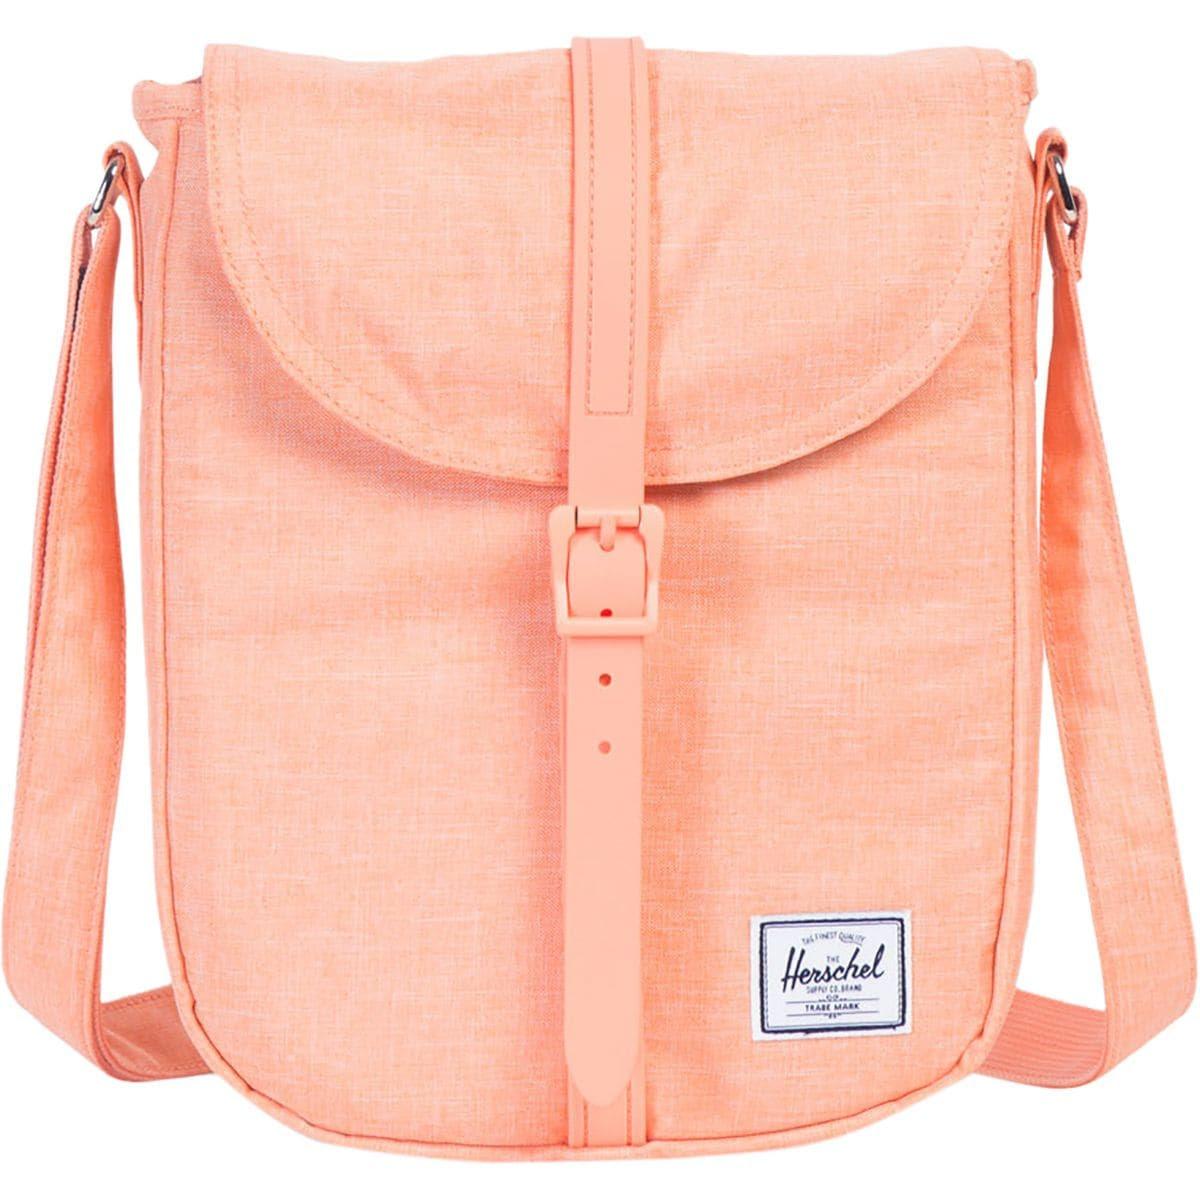 Herschel Supply Kingsgate Crossbody Bag - Women's